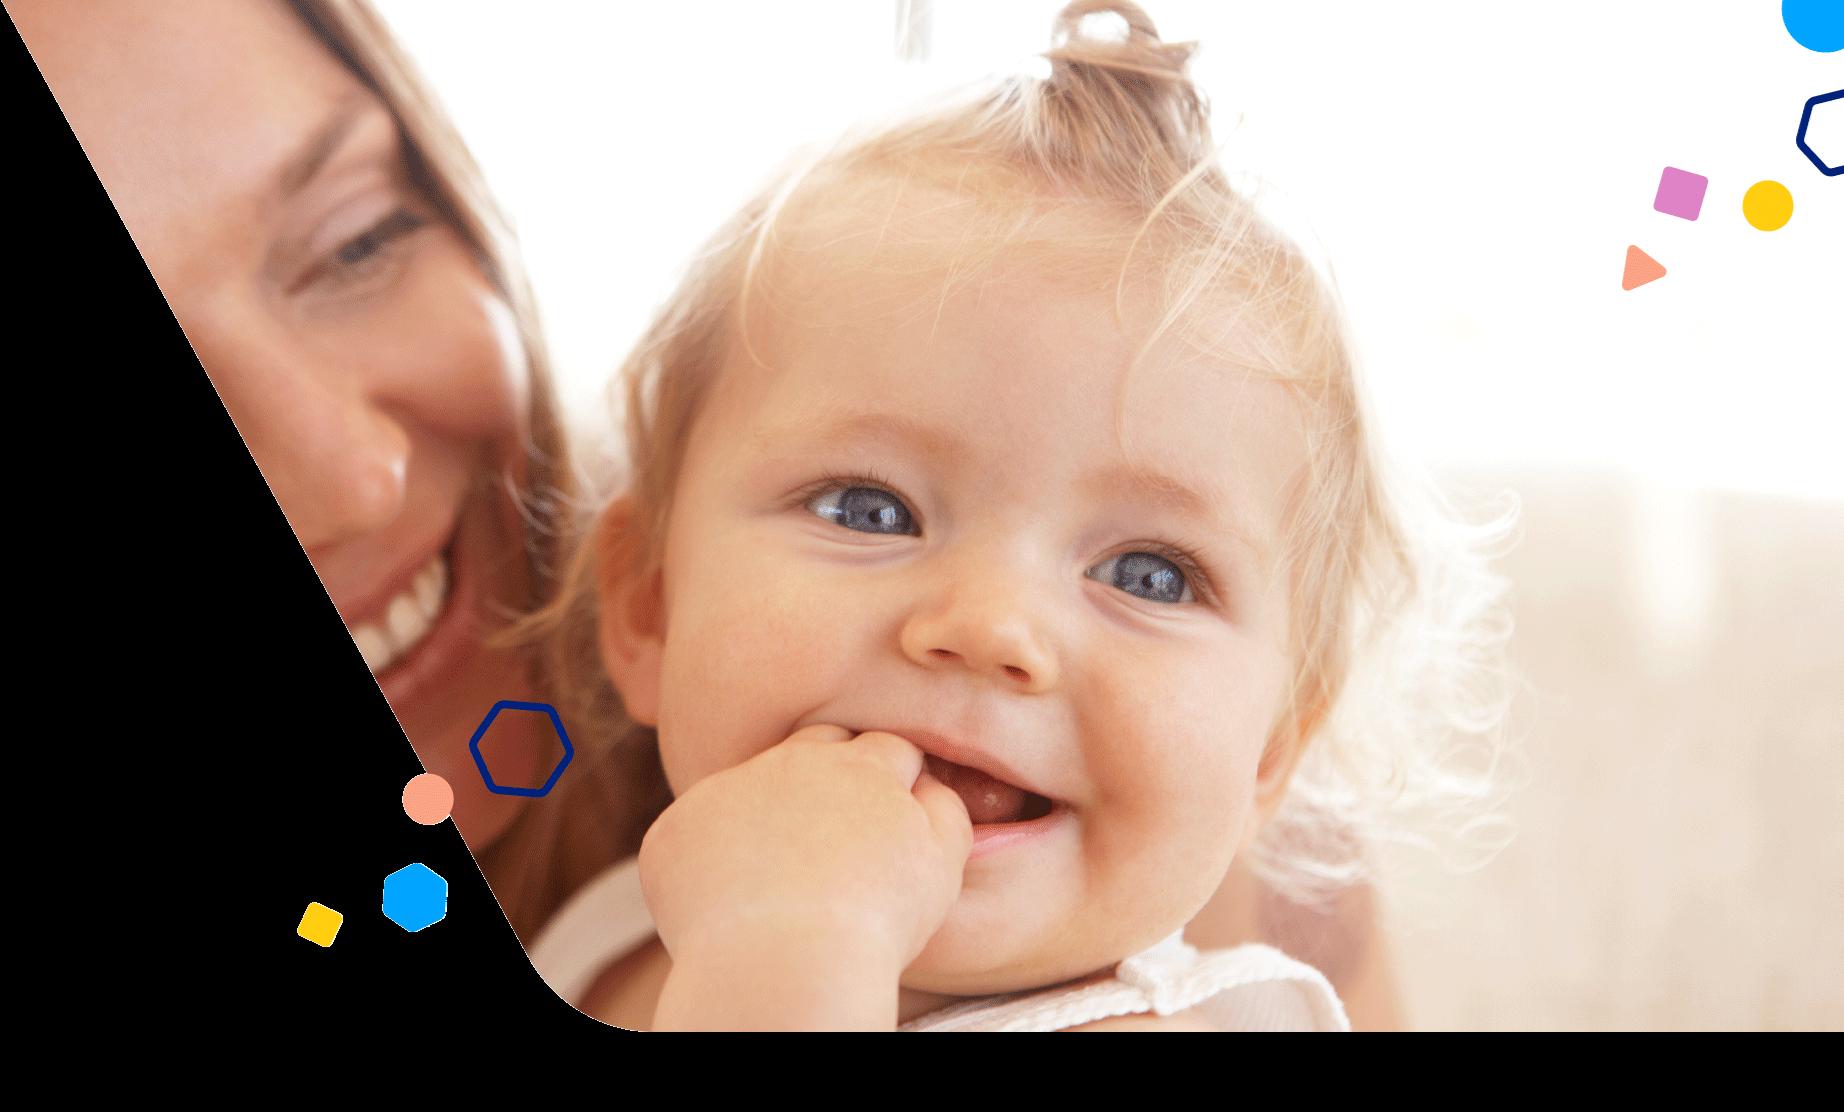 infant-communication-language-and-hearing